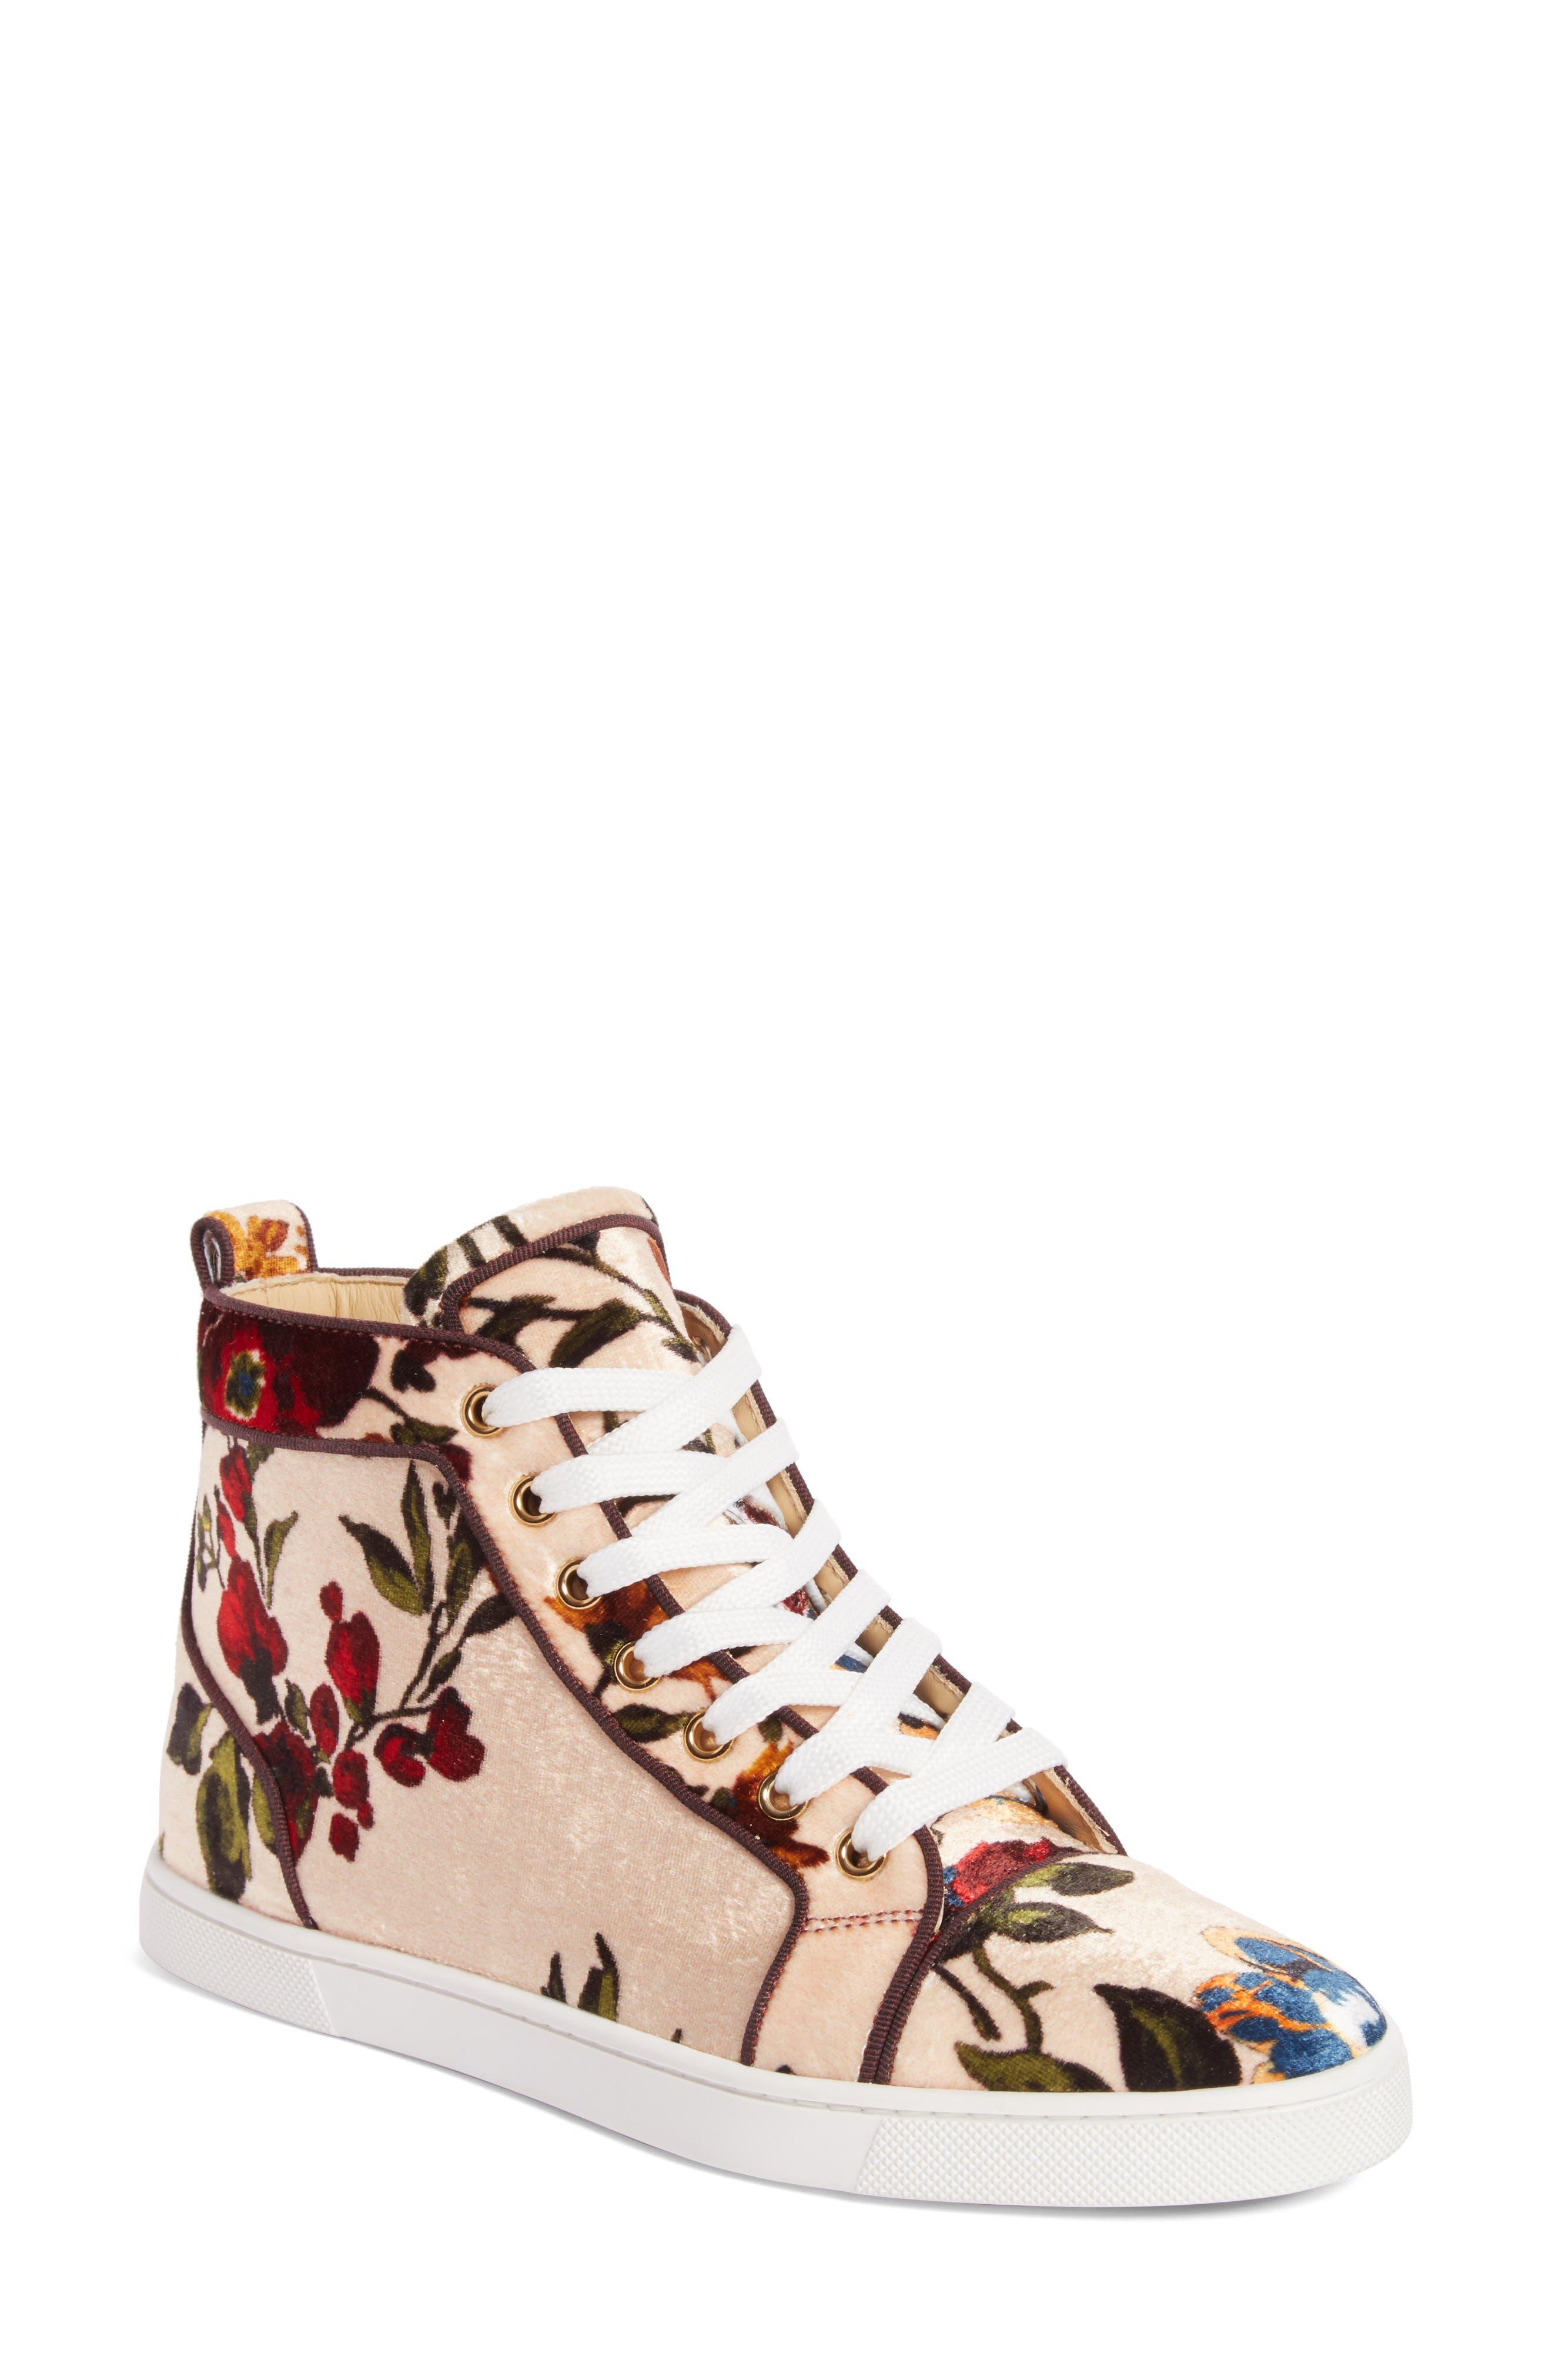 CHRISTIAN LOUBOUTIN Bip Bip Floral Sneaker